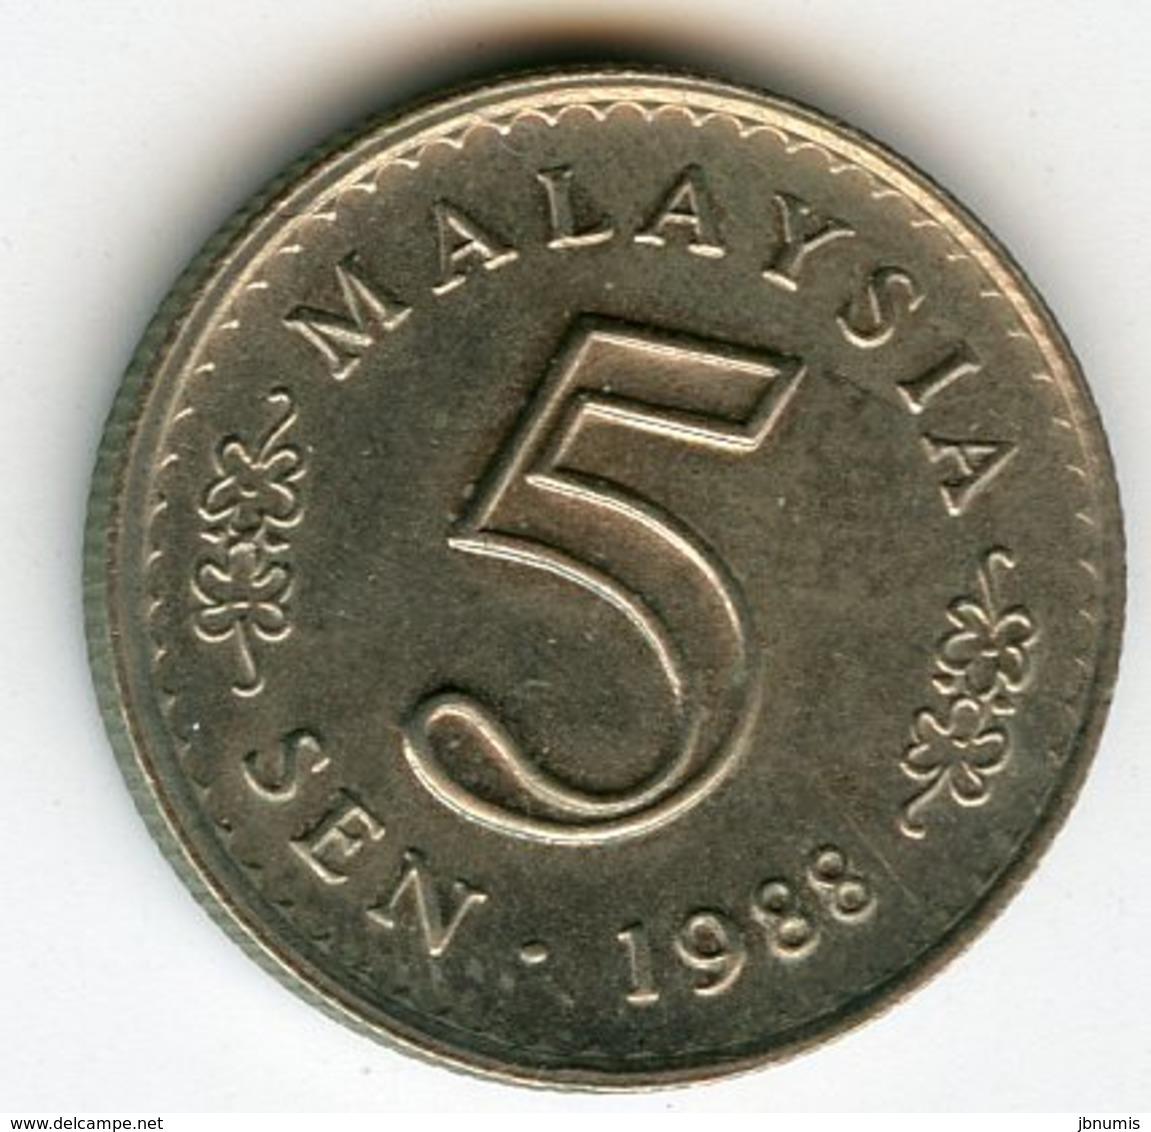 Malaysie Malaysia 5 Sen 1988 KM 2 - Malaysie